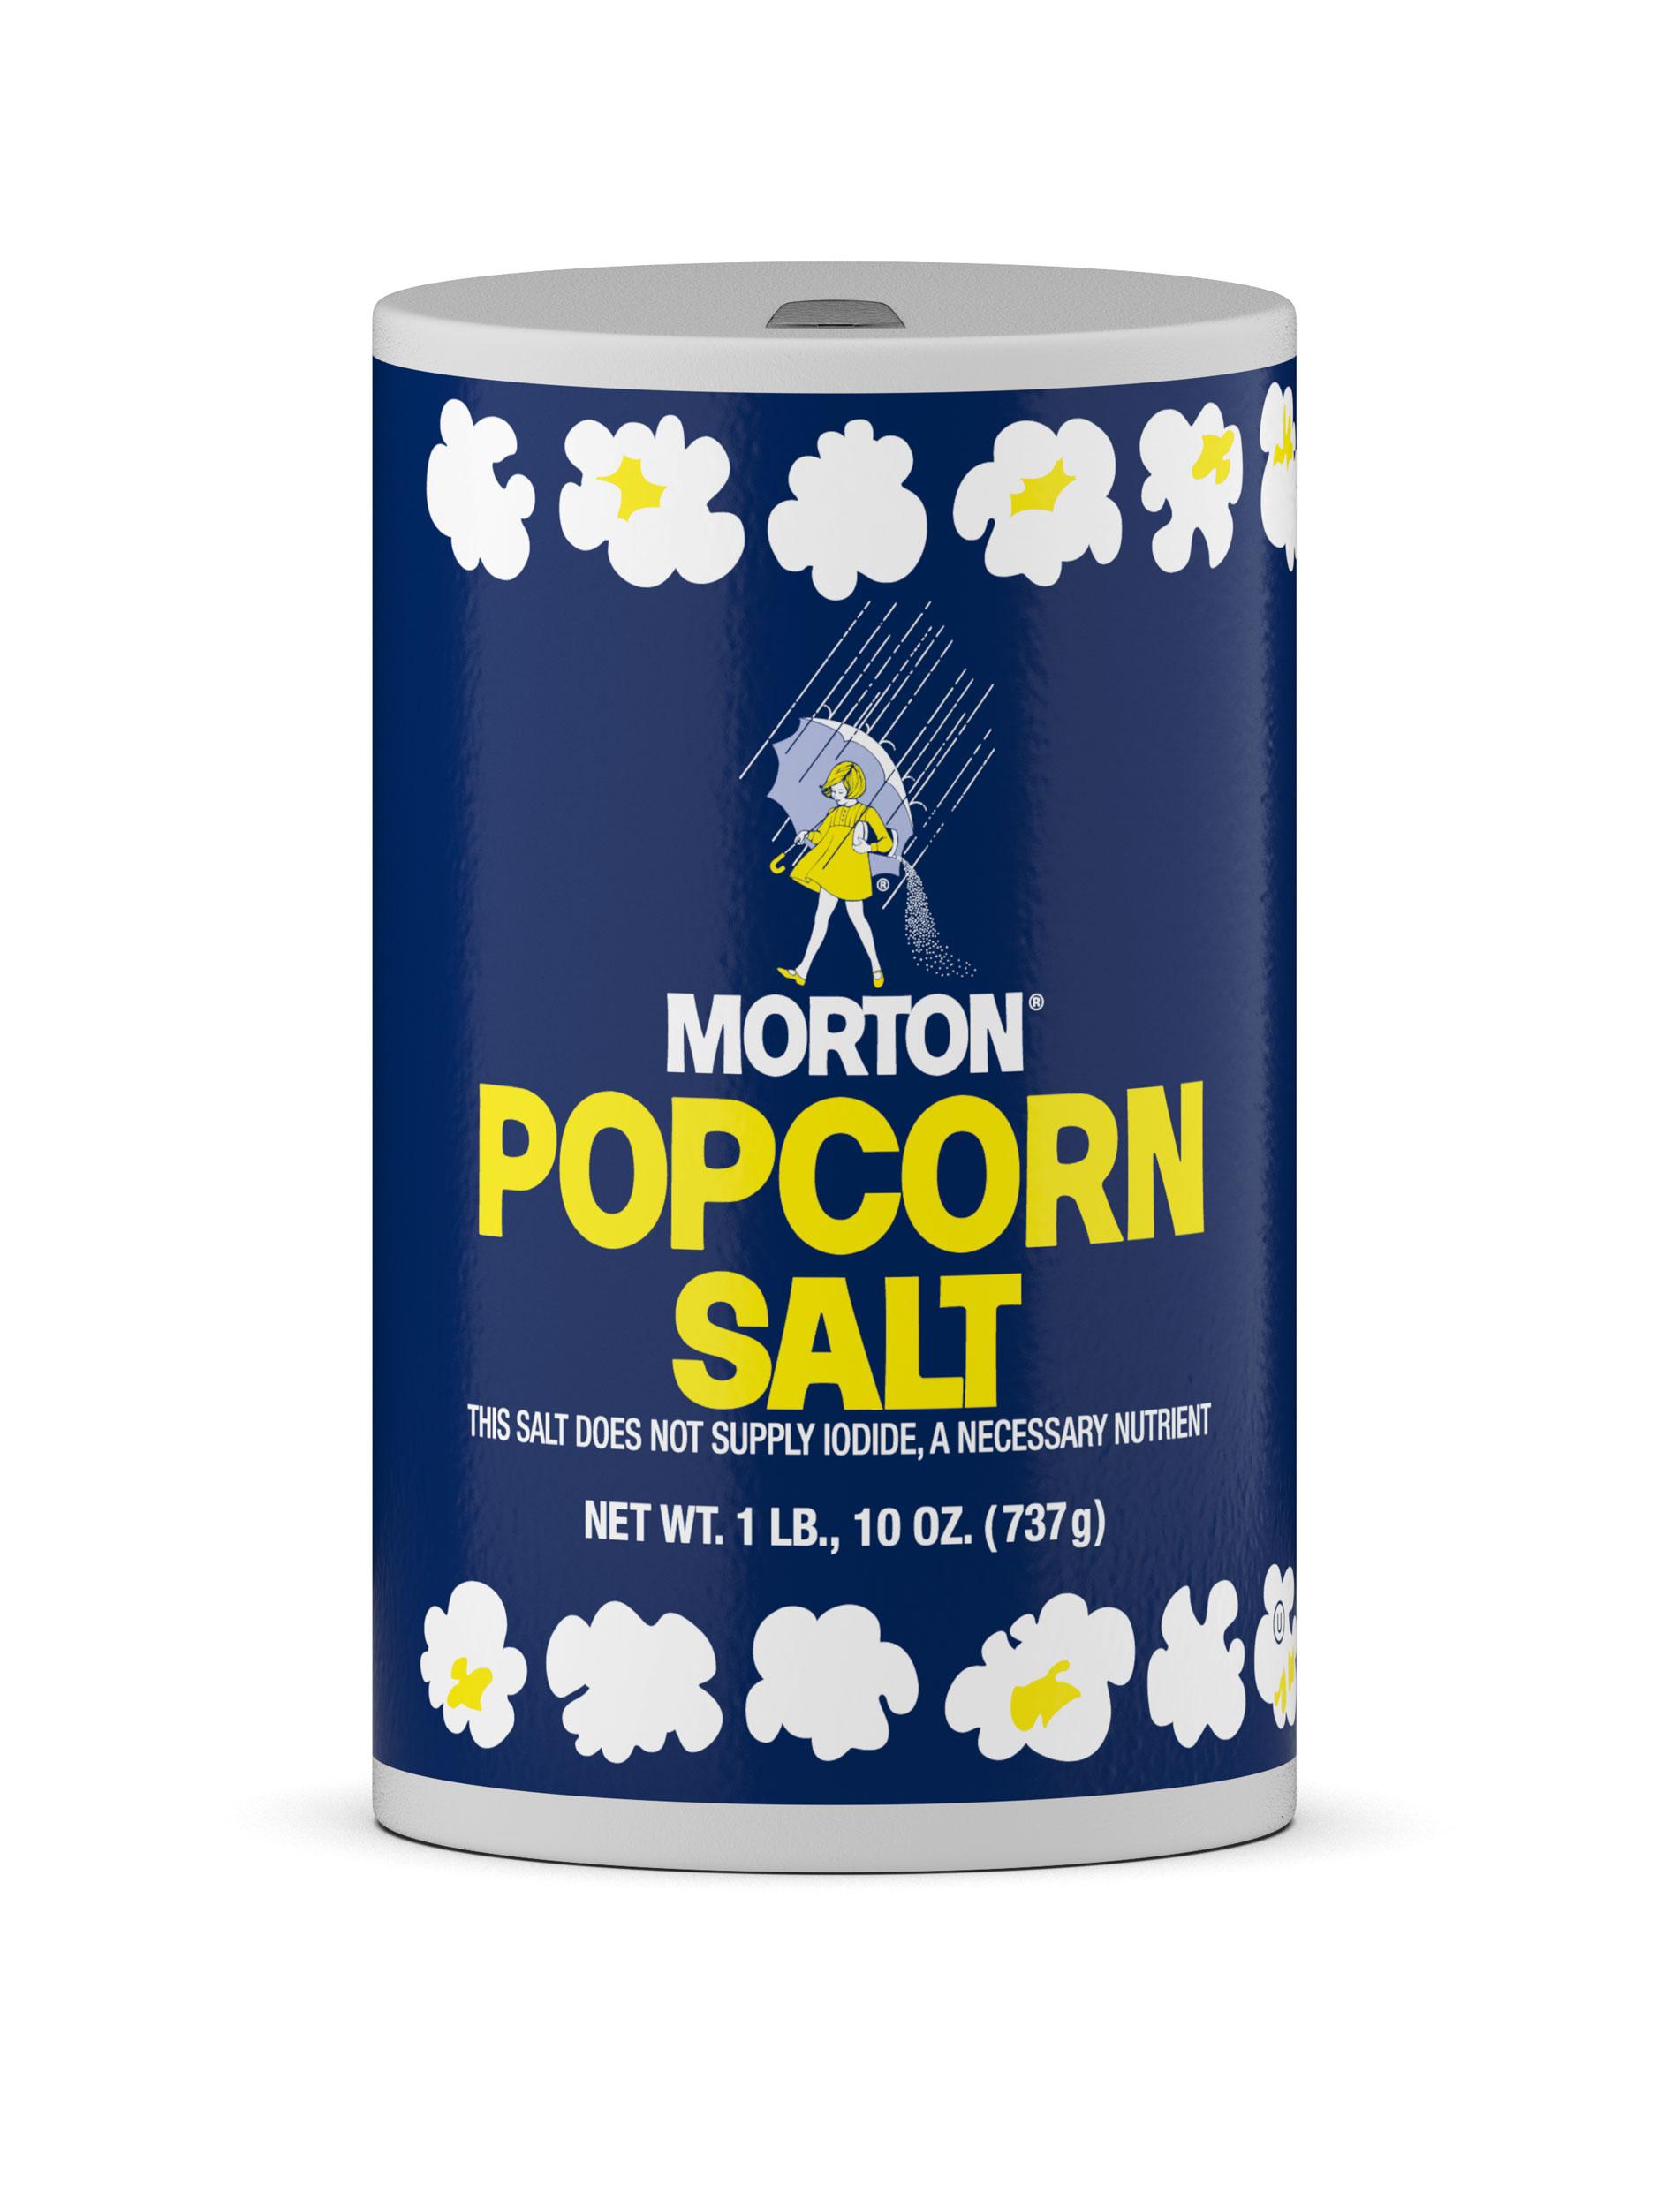 professional computer generated image of popcorn salt